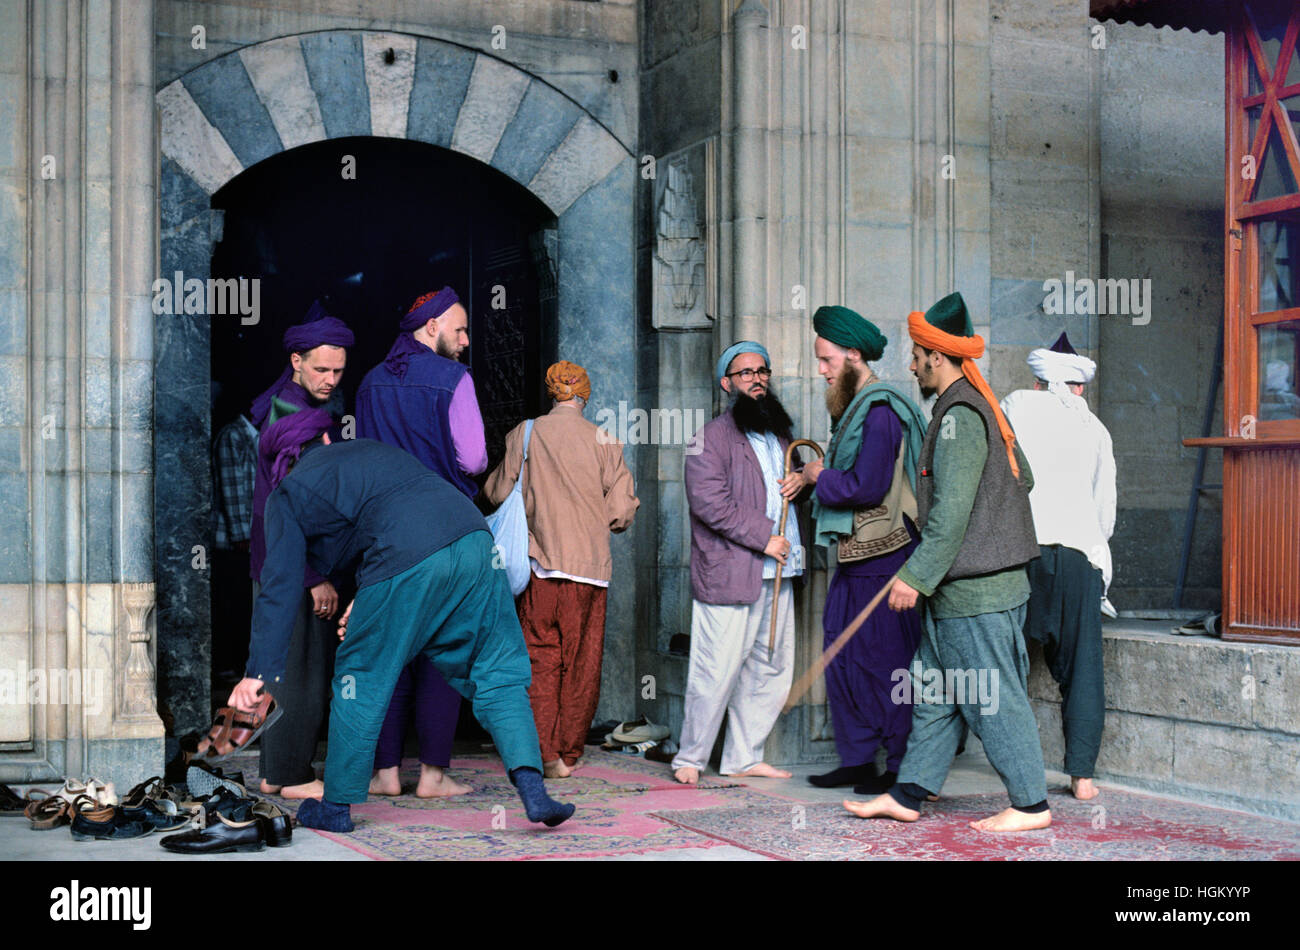 Western Converts to Islam on Pilgrimage Outside the Mevlana Museum or Shrine (1274) Konya Turkey - Stock Image